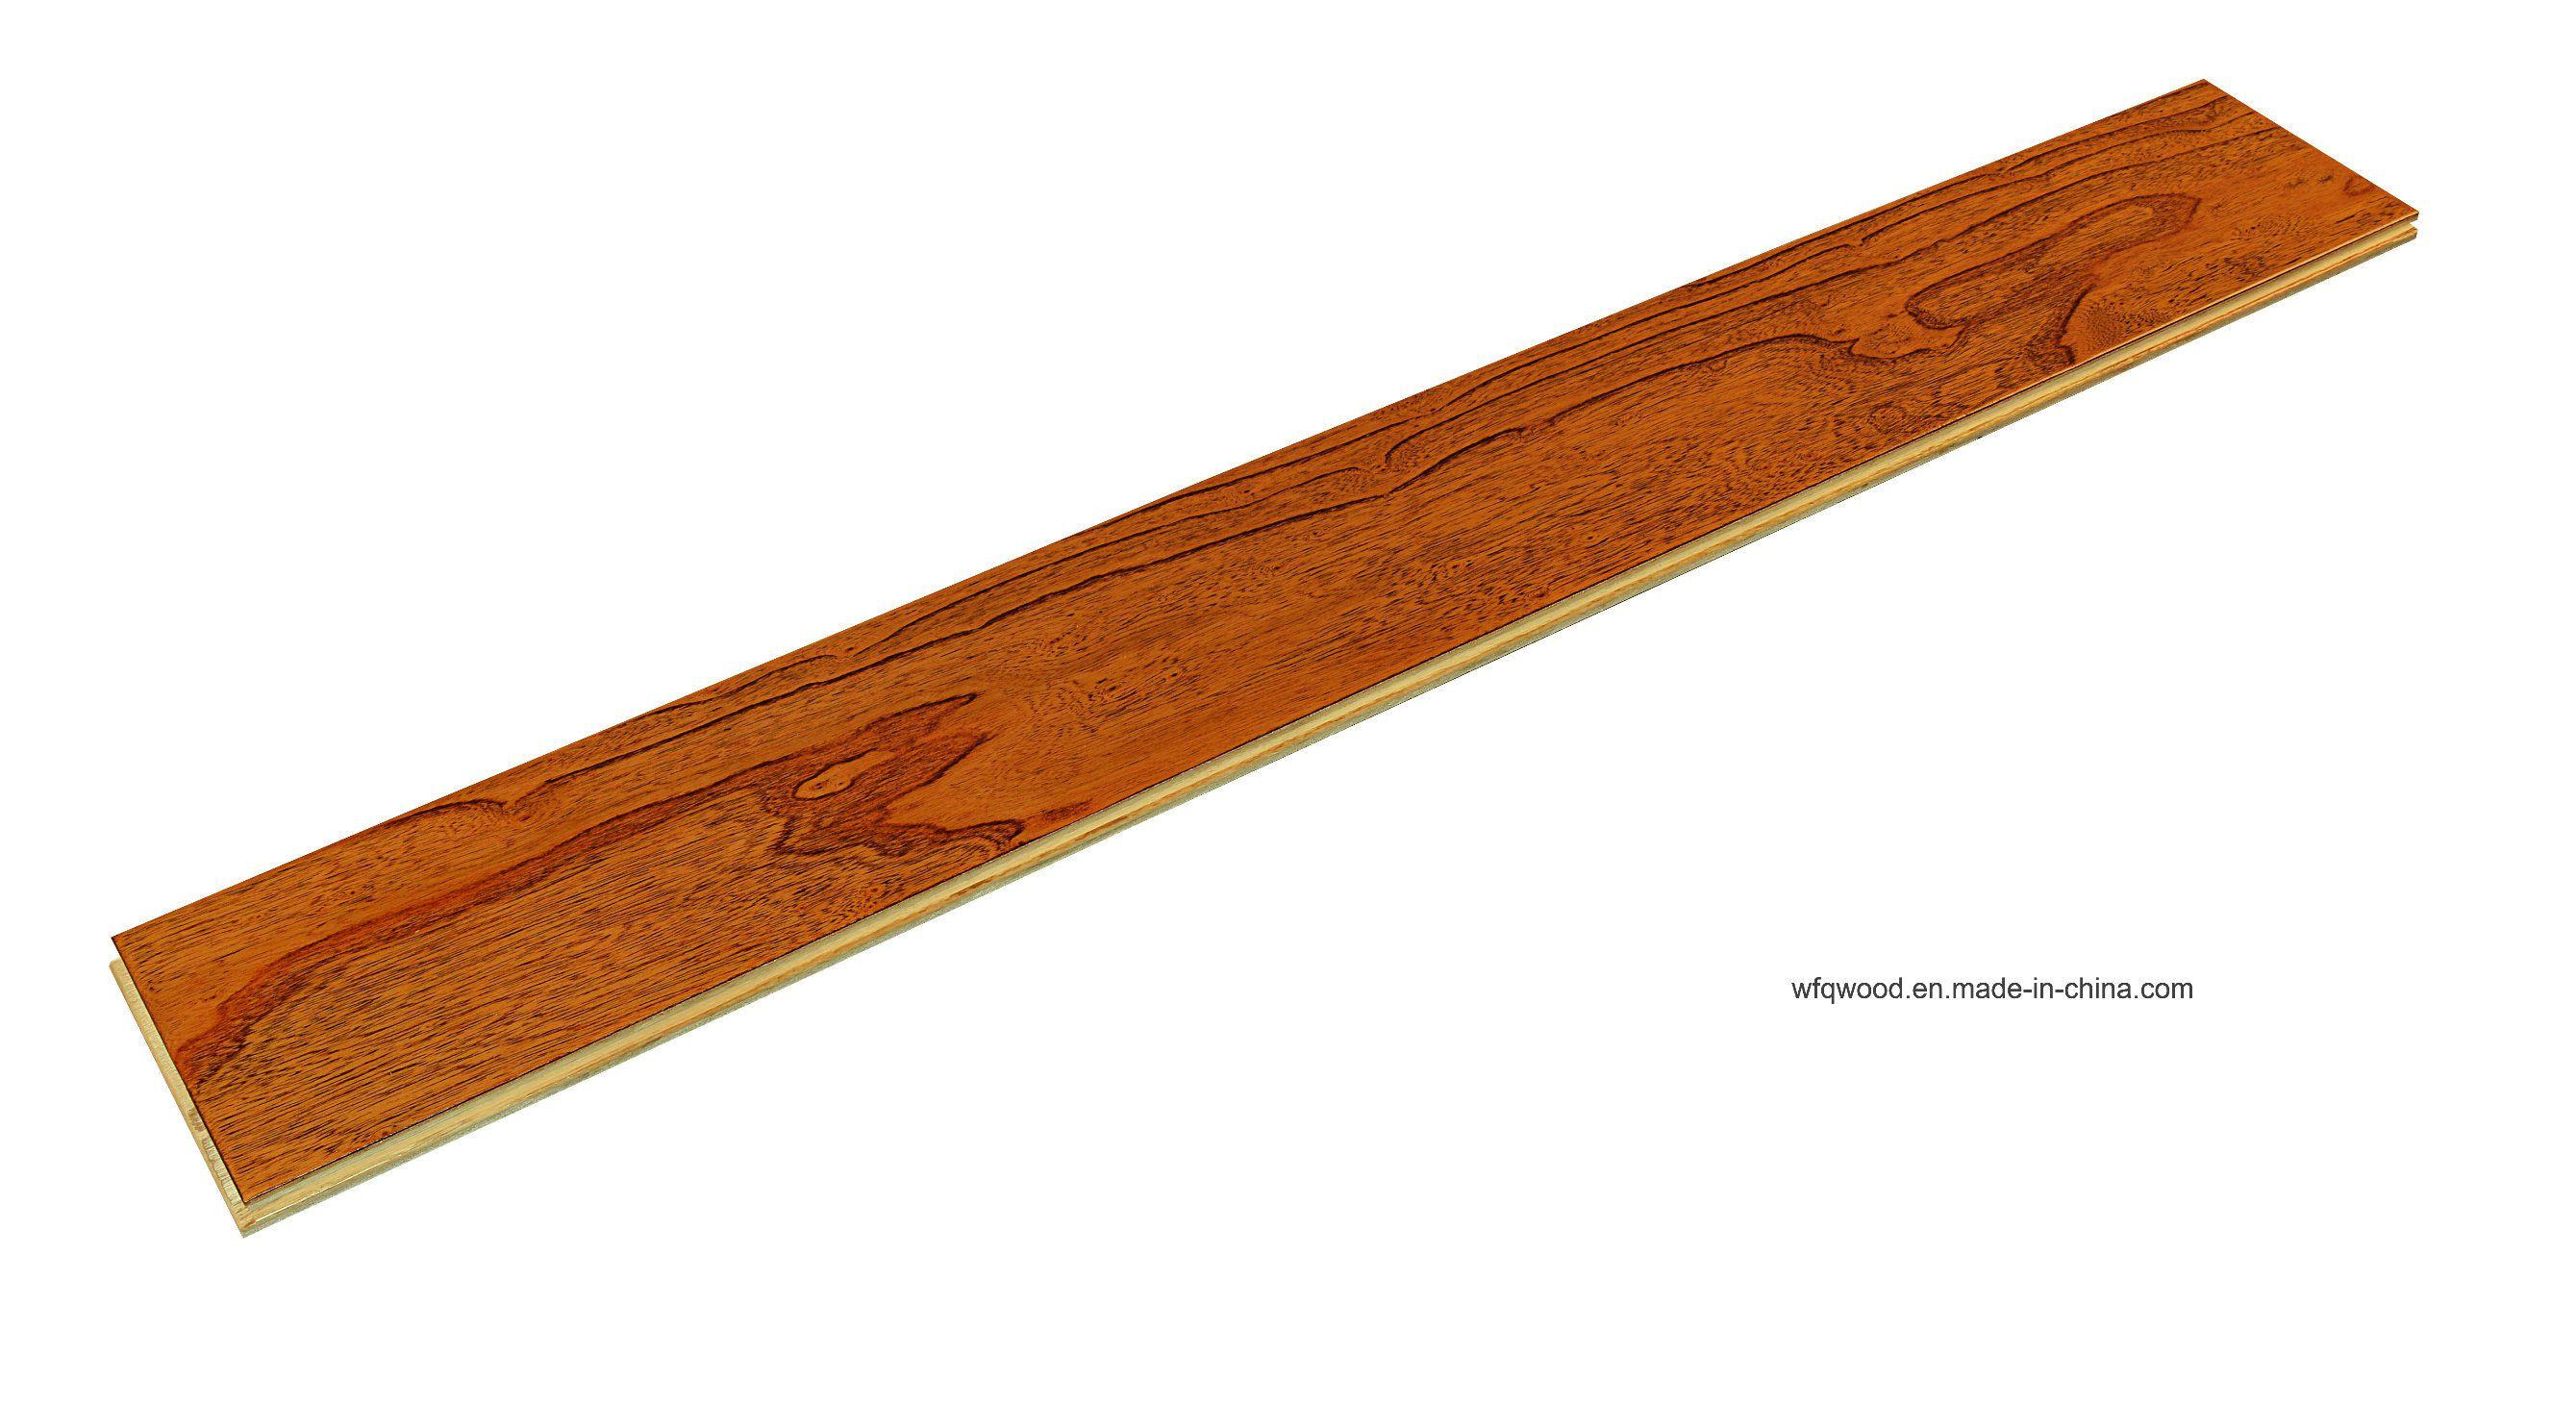 802 Multilayer Elm Wood Flooring